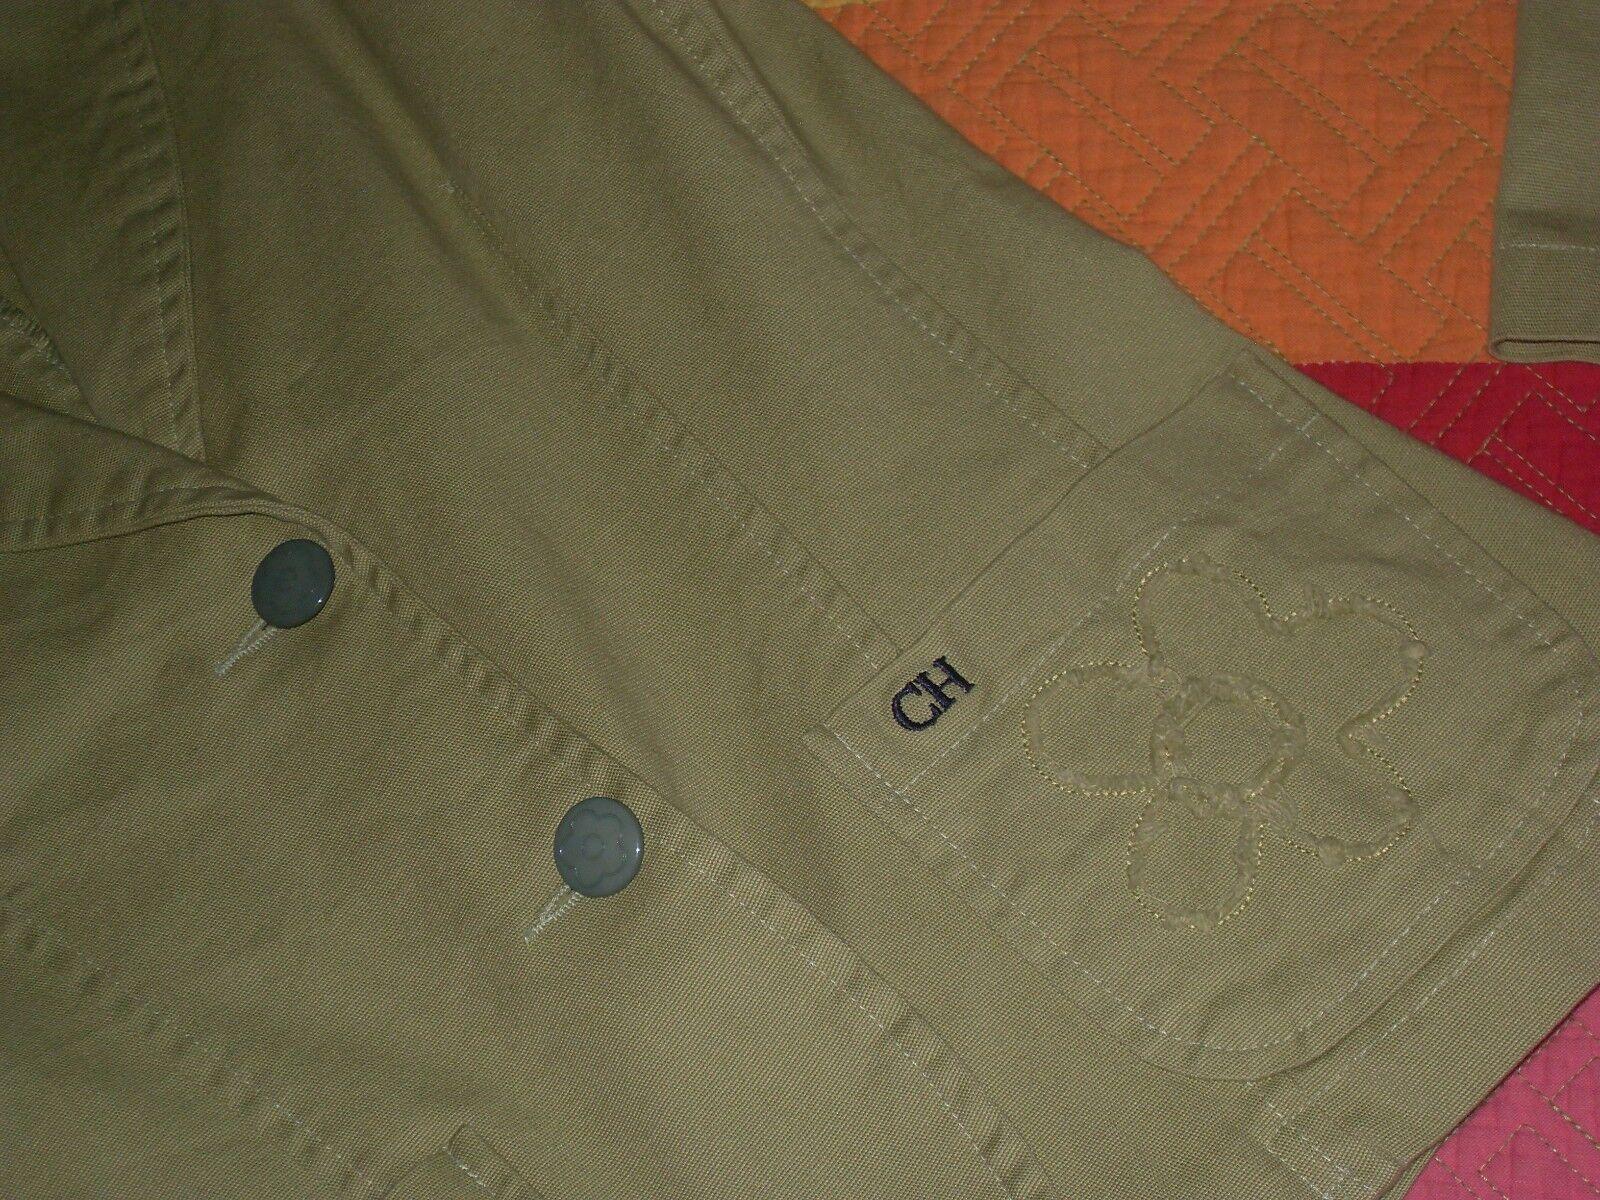 Chaqueta Carolina Herrera fina green bolsillo deshilacha detalle botones size S